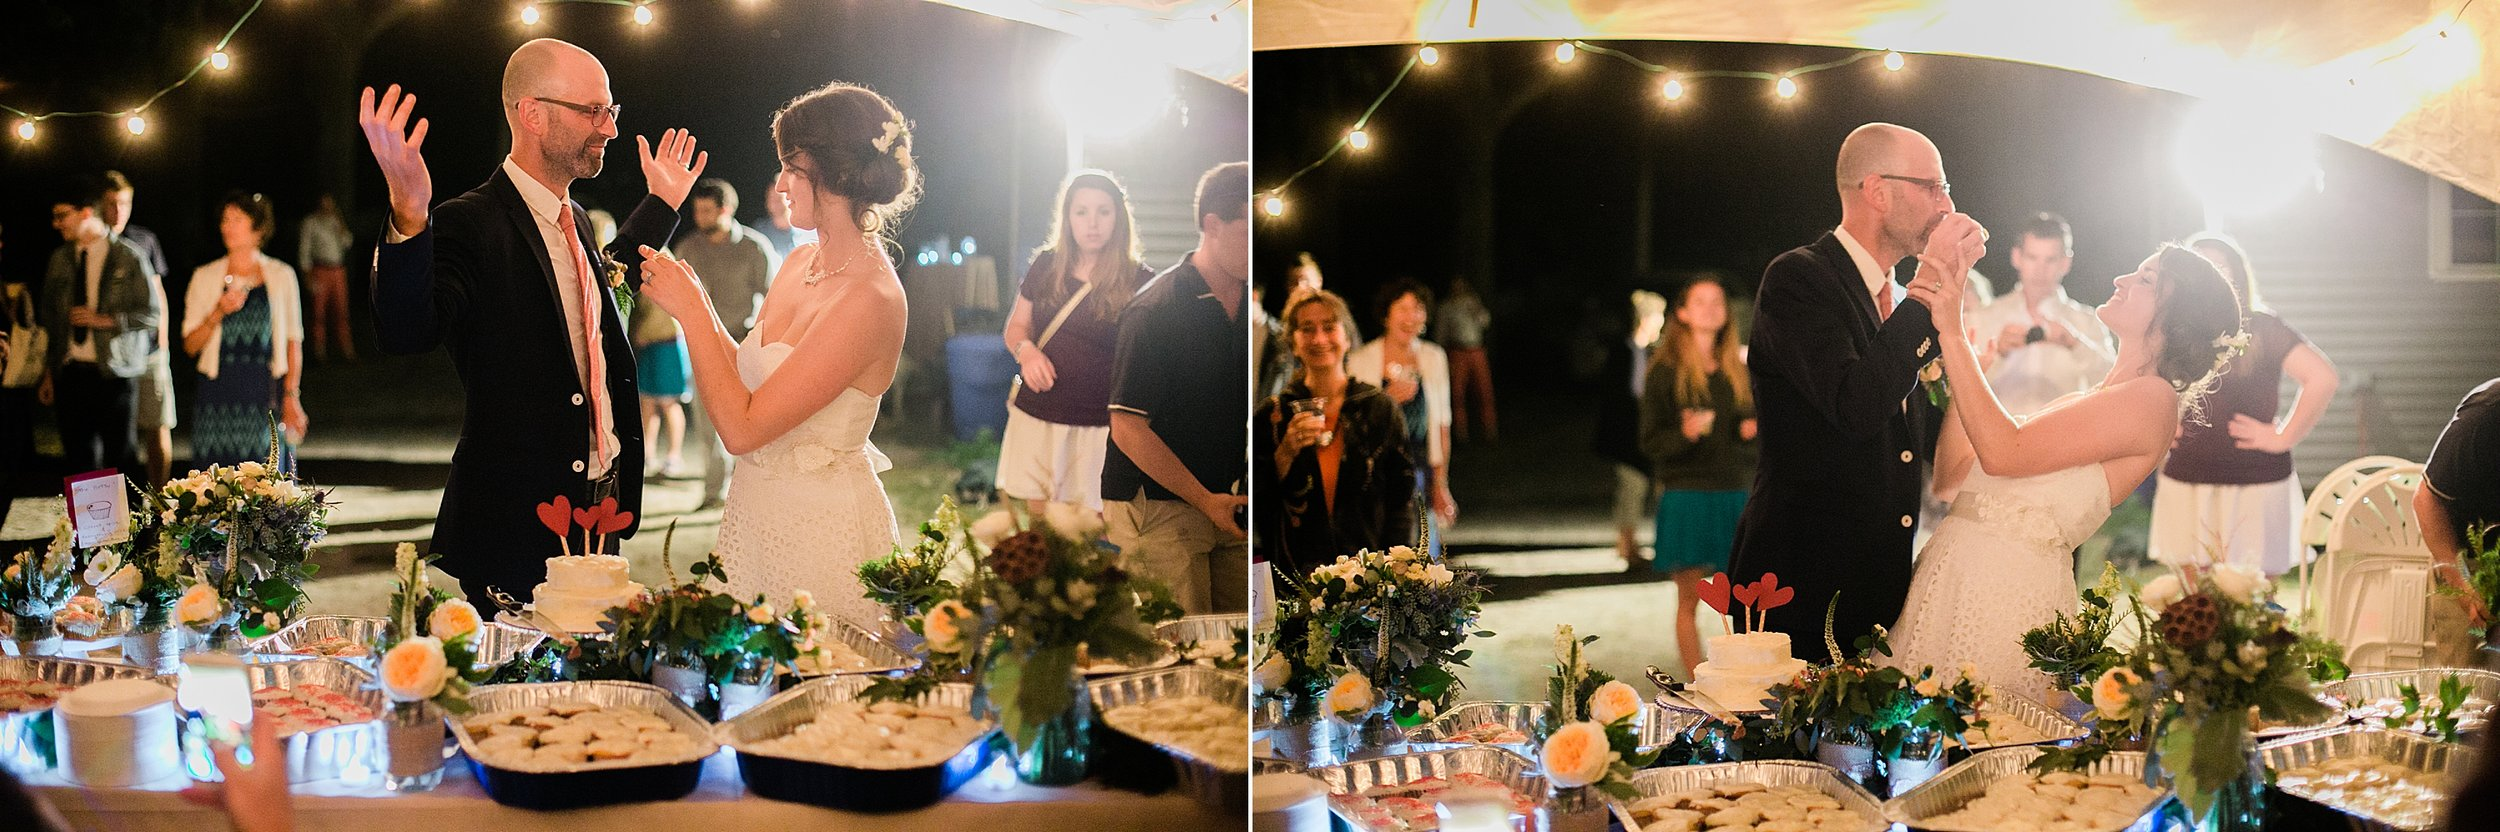 113 los angeles wedding photographer.jpg